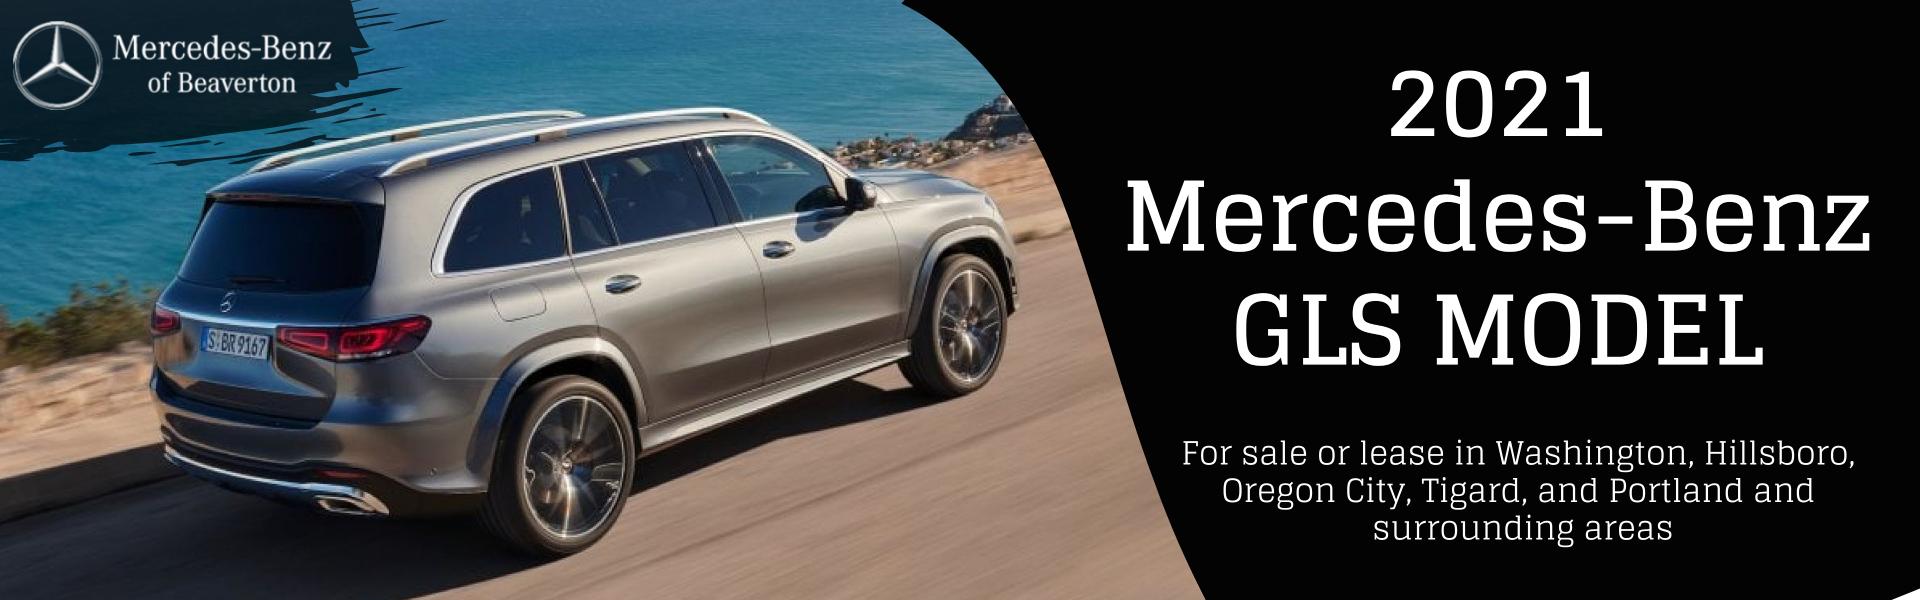 2021 GLS Mercedes-Benz of Beaverton